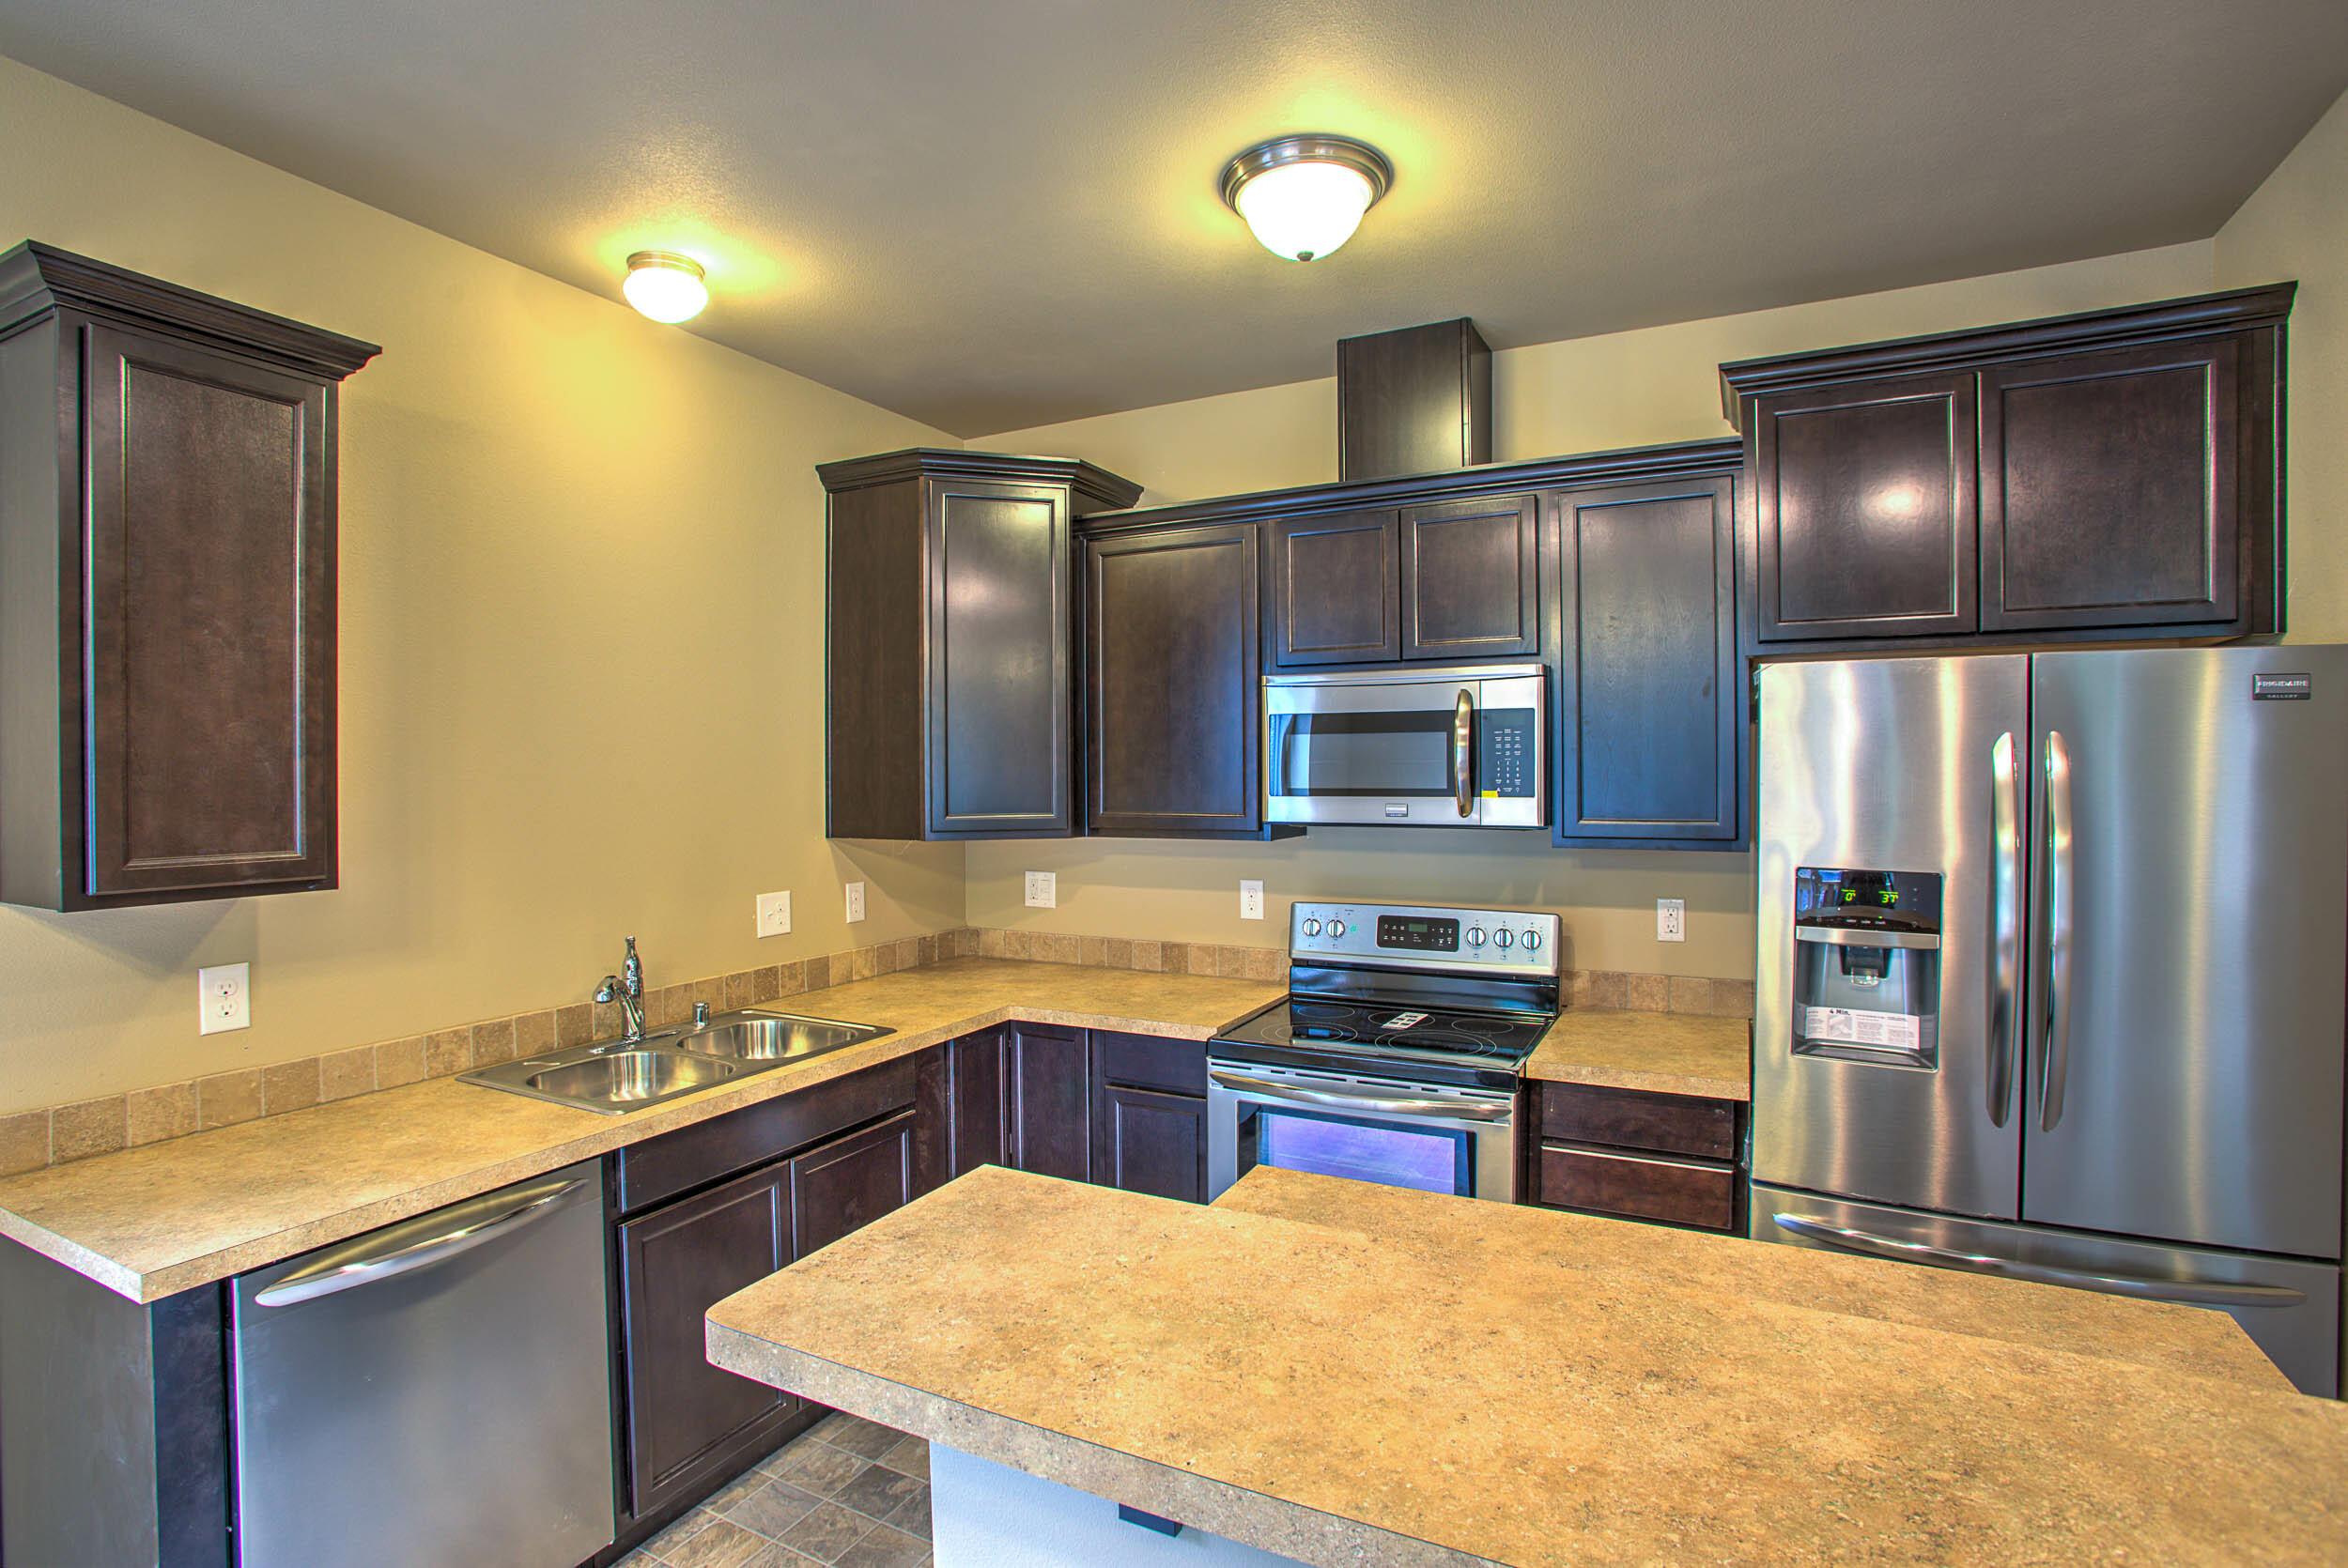 9 Foreman Rd, Mccleary, WA - USA (photo 4)